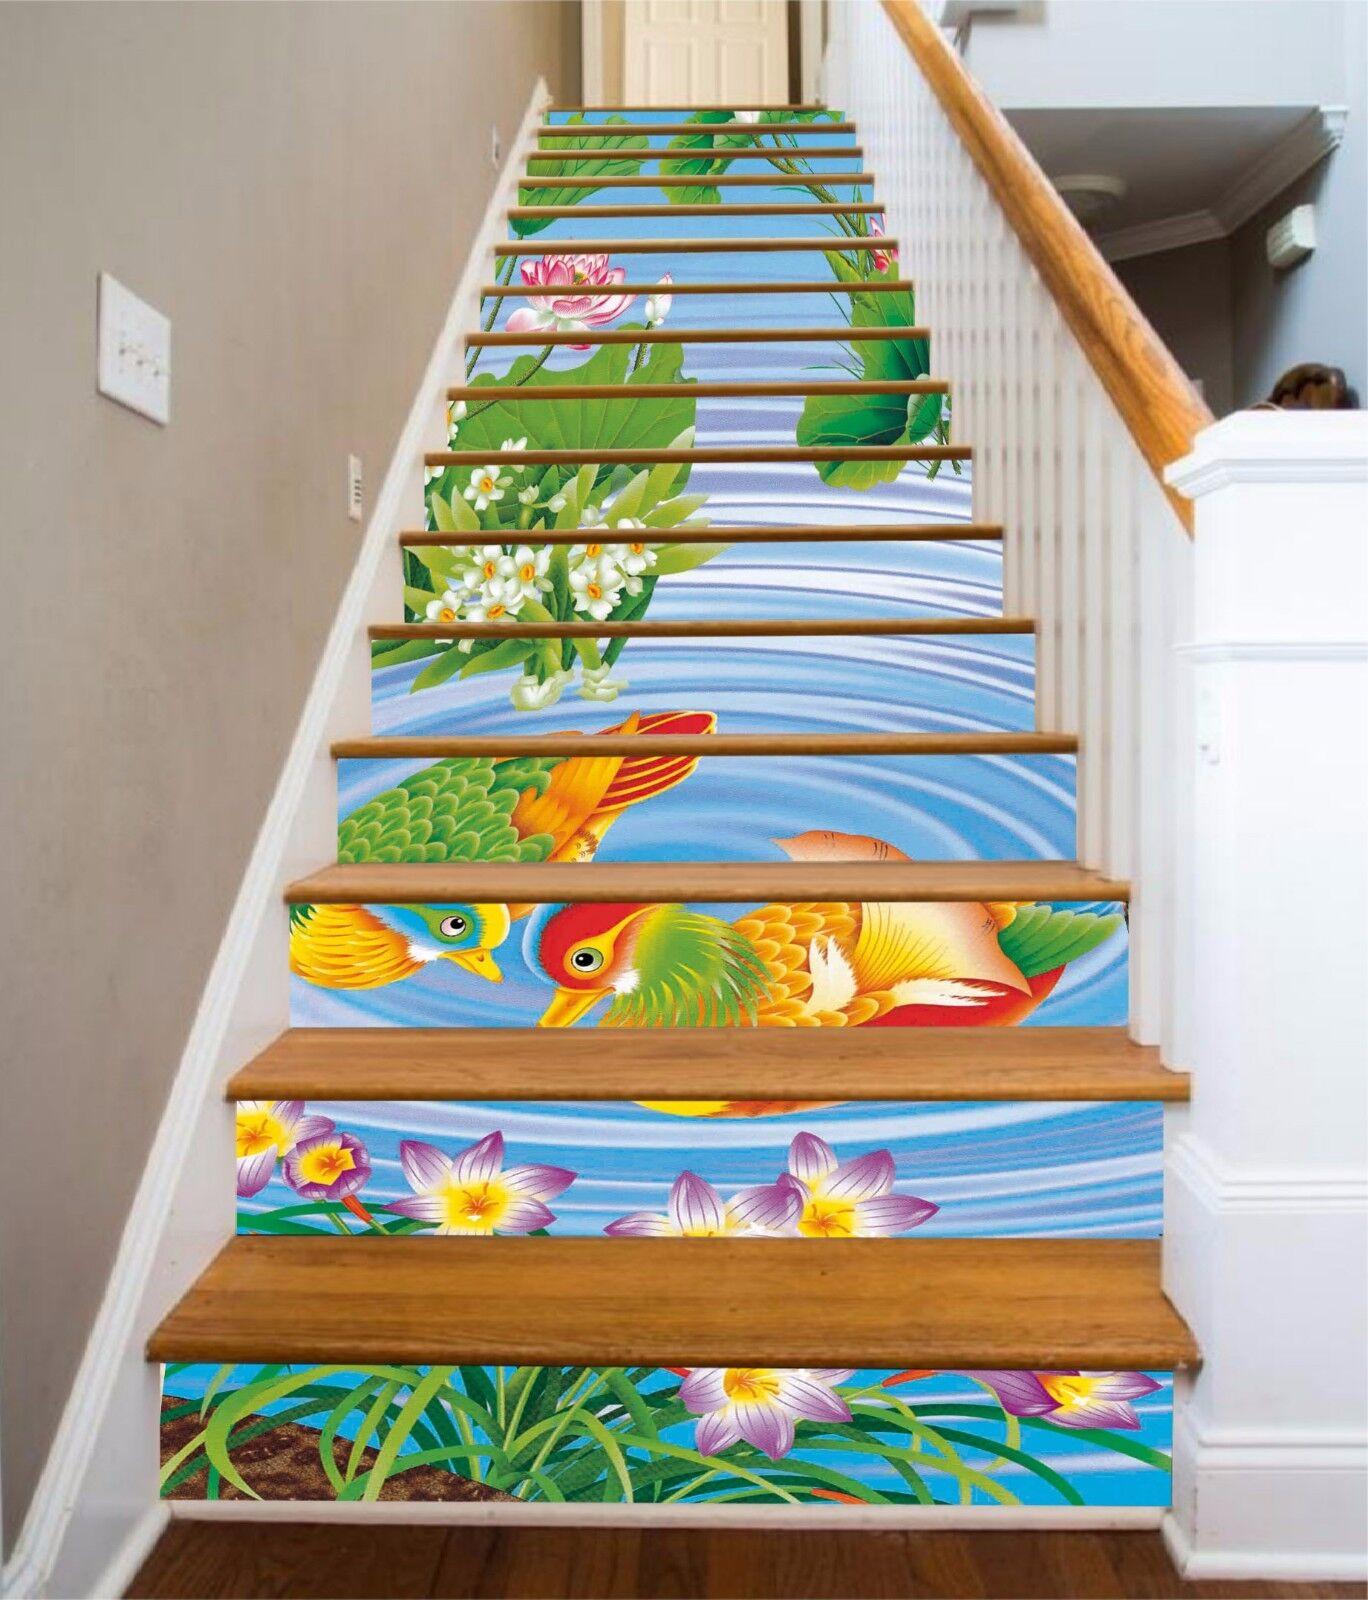 3D Lotus Pond 7764 Stair Risers Decoration Photo Mural Vinyl Decal Wallpaper AU